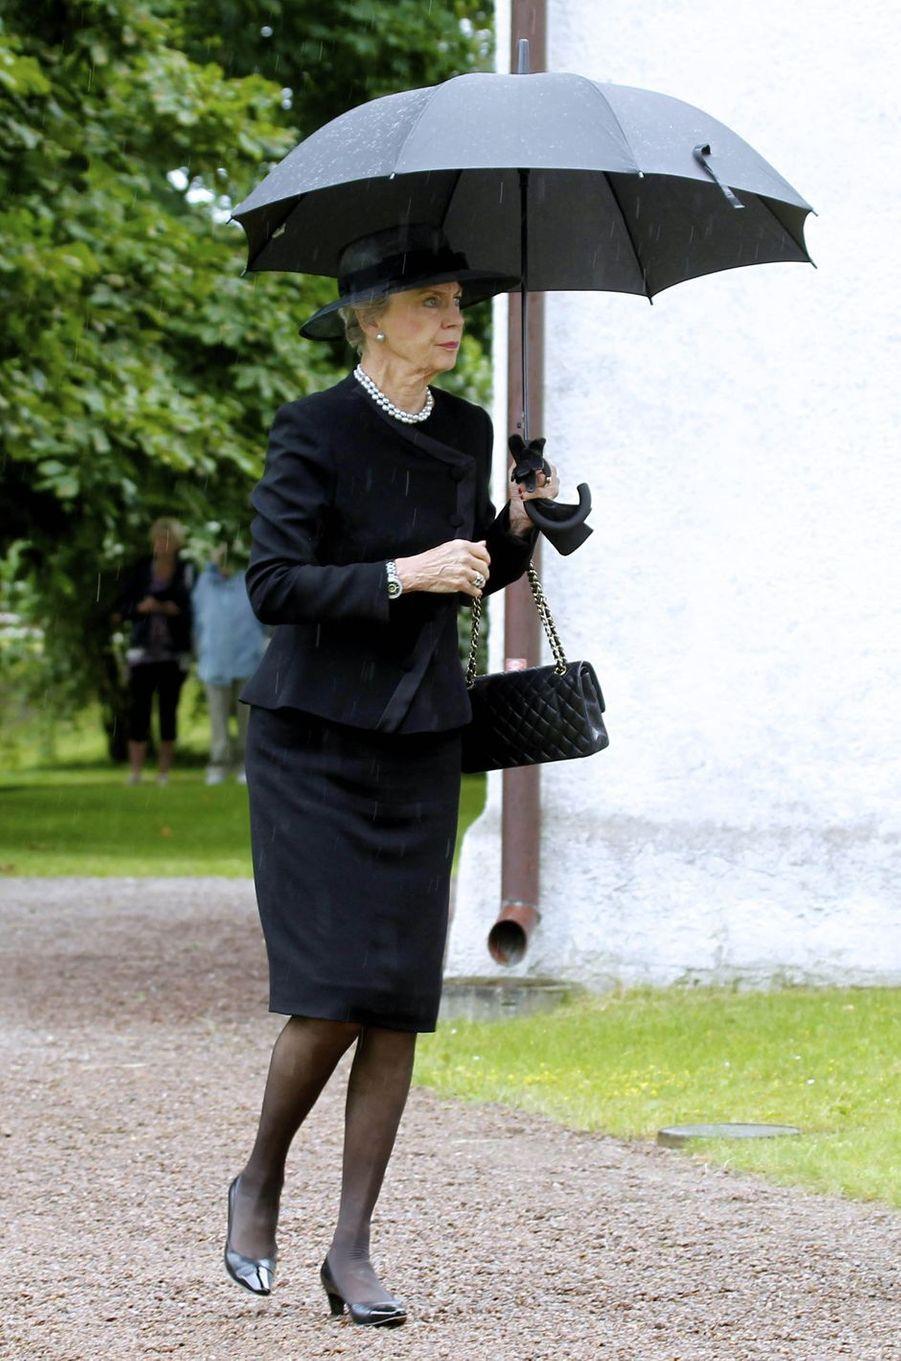 La princesse Benedikte de Danemark à Trolle-Ljungby, le 12 juillet 2017